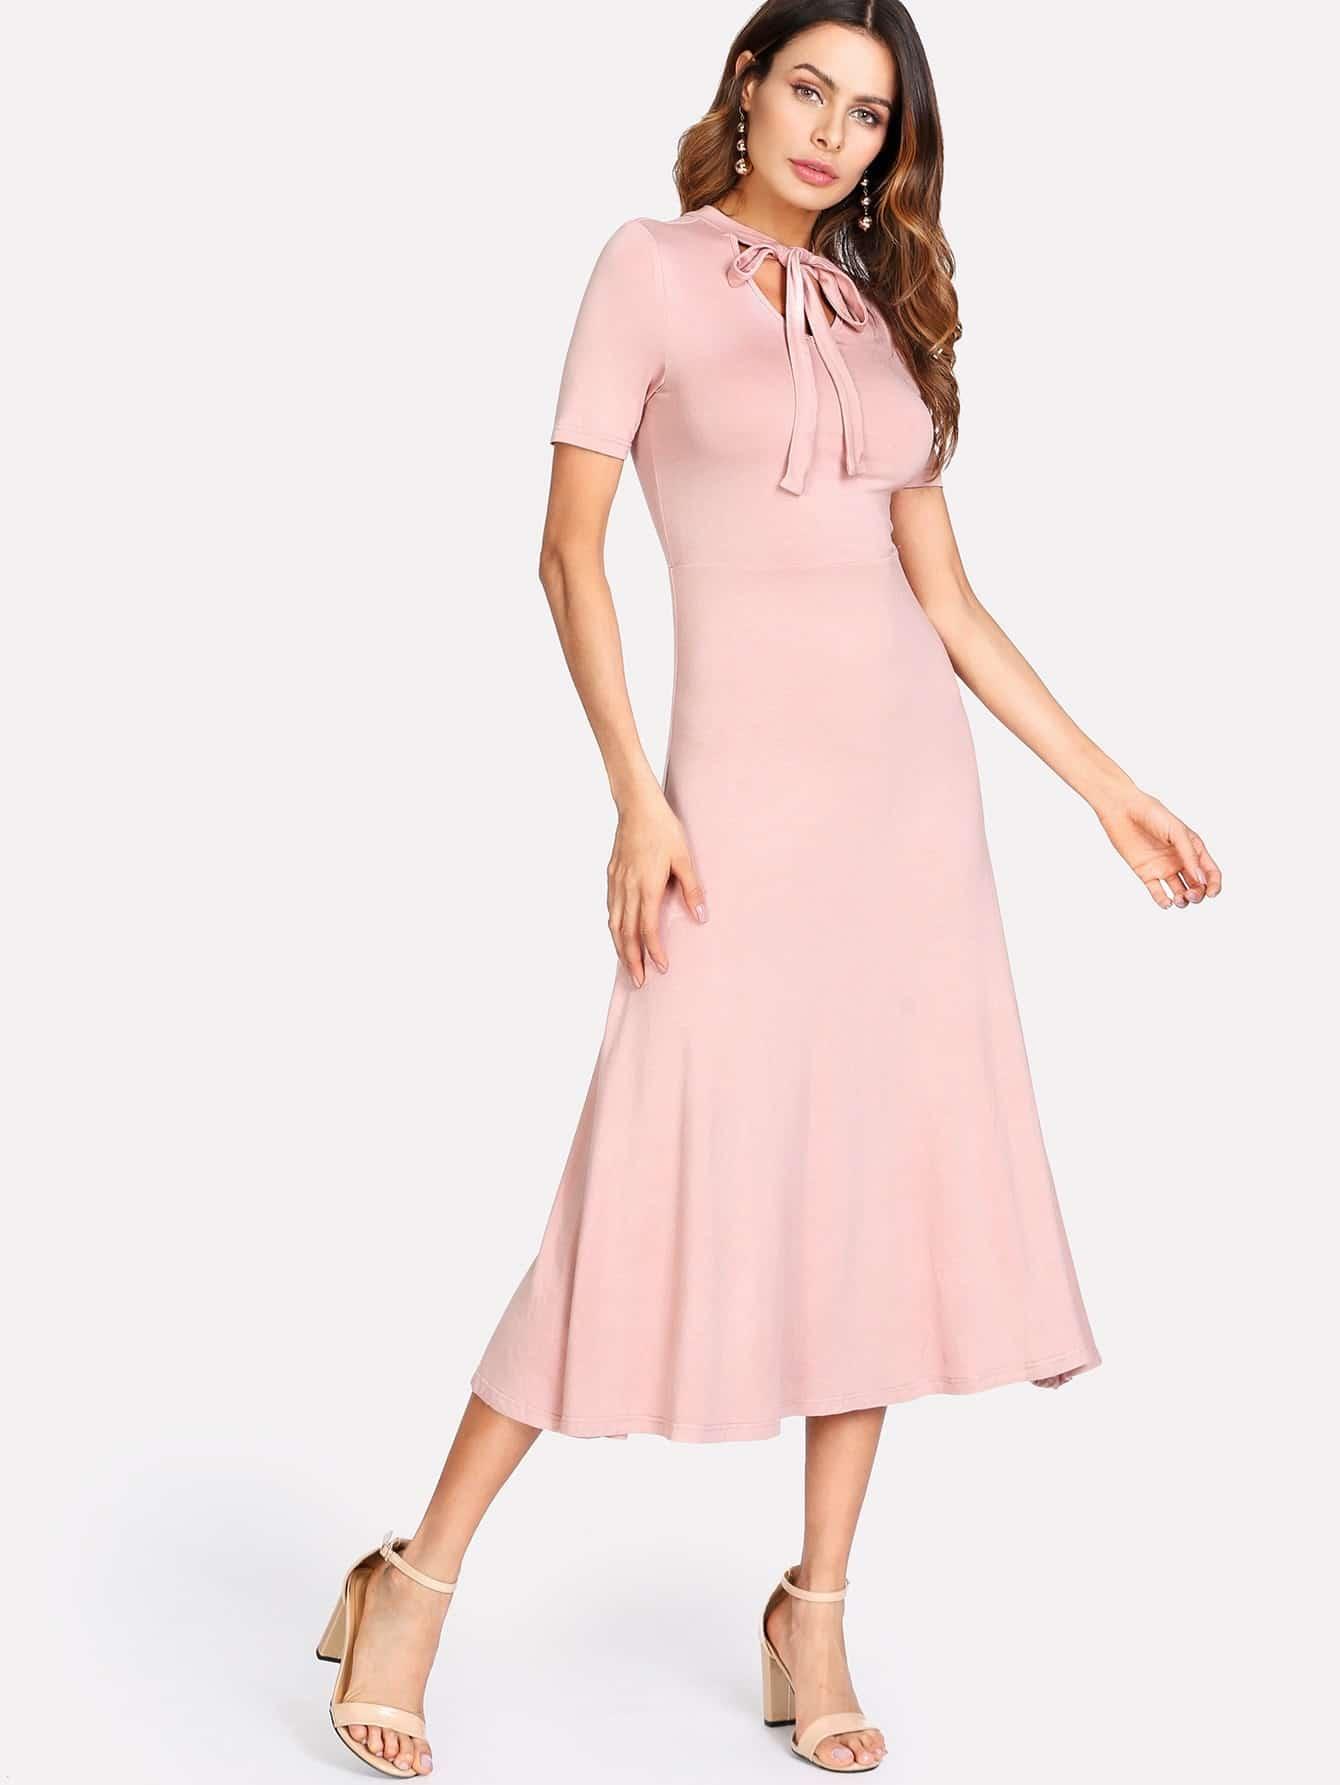 Tied Neck Solid Fit & Flare Dress bishop sleeve tied neck striped flare dress